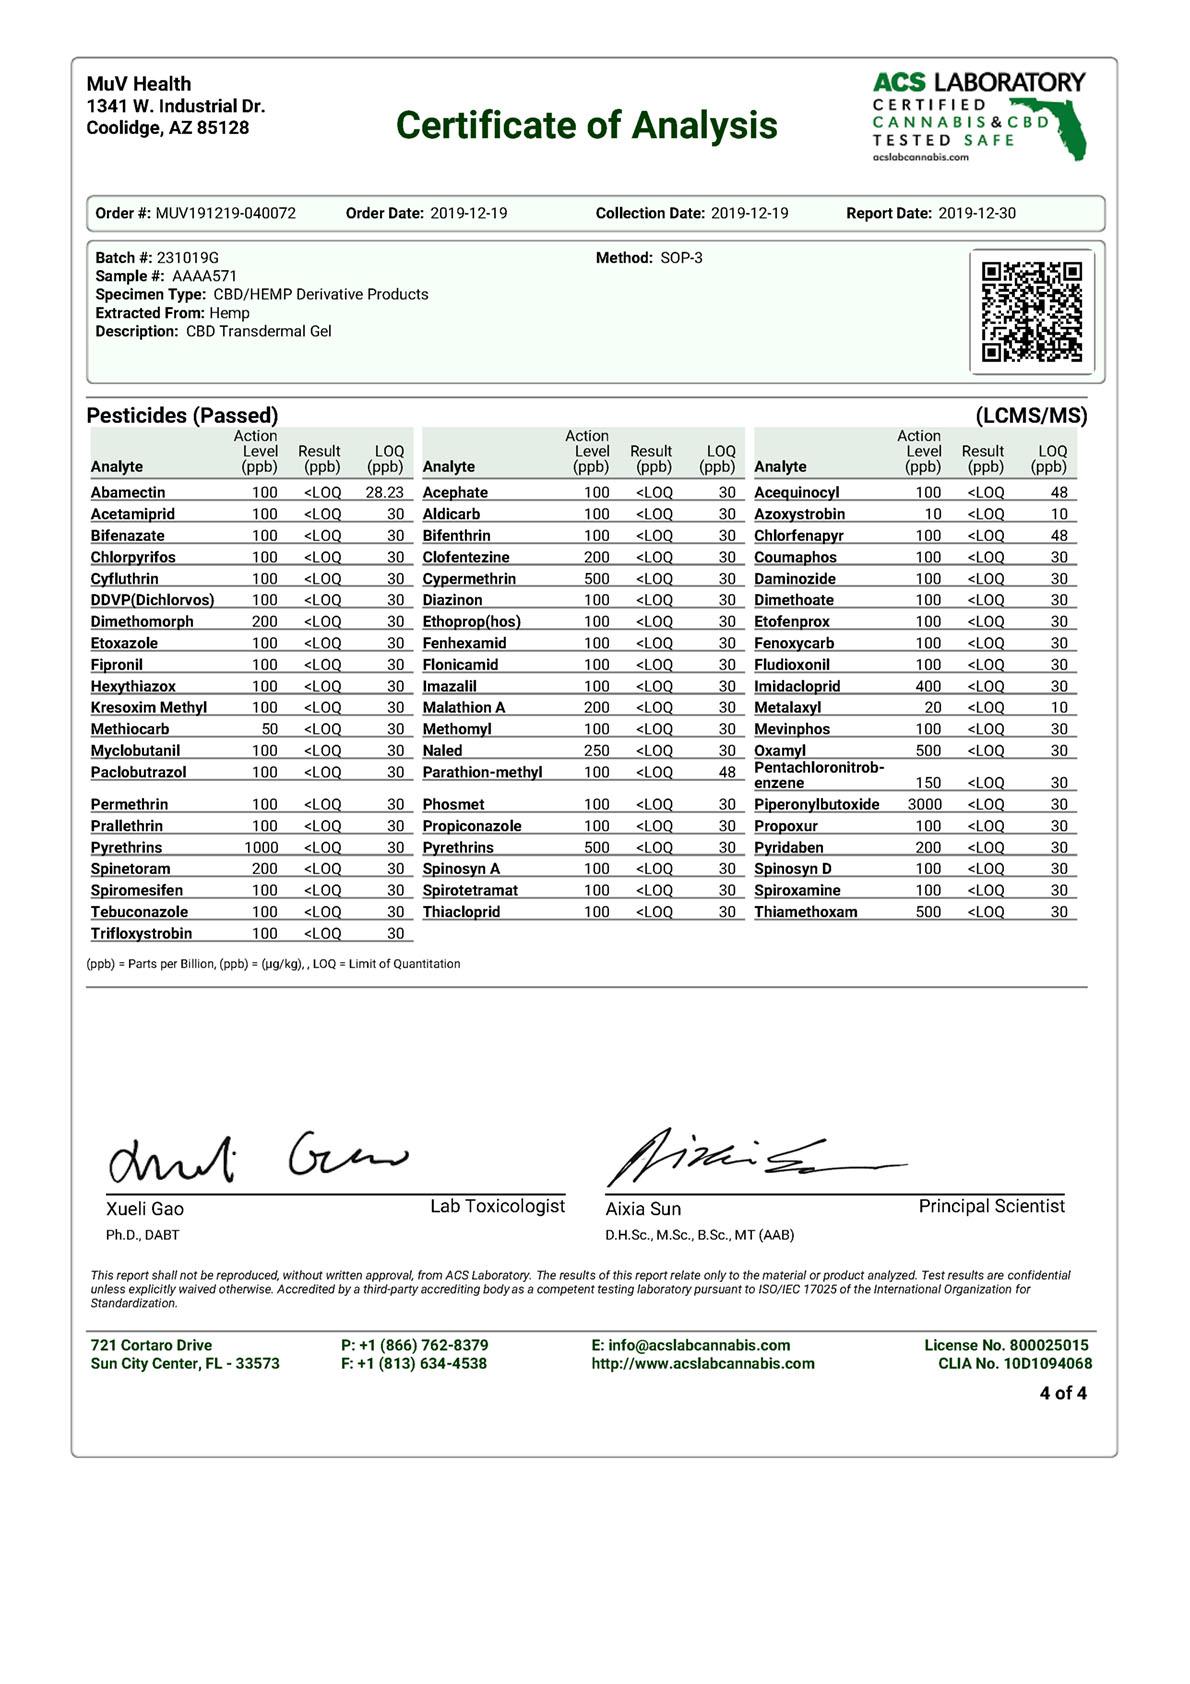 muv-cbd-transdermal-gel-coa-231019g-page-4.jpg